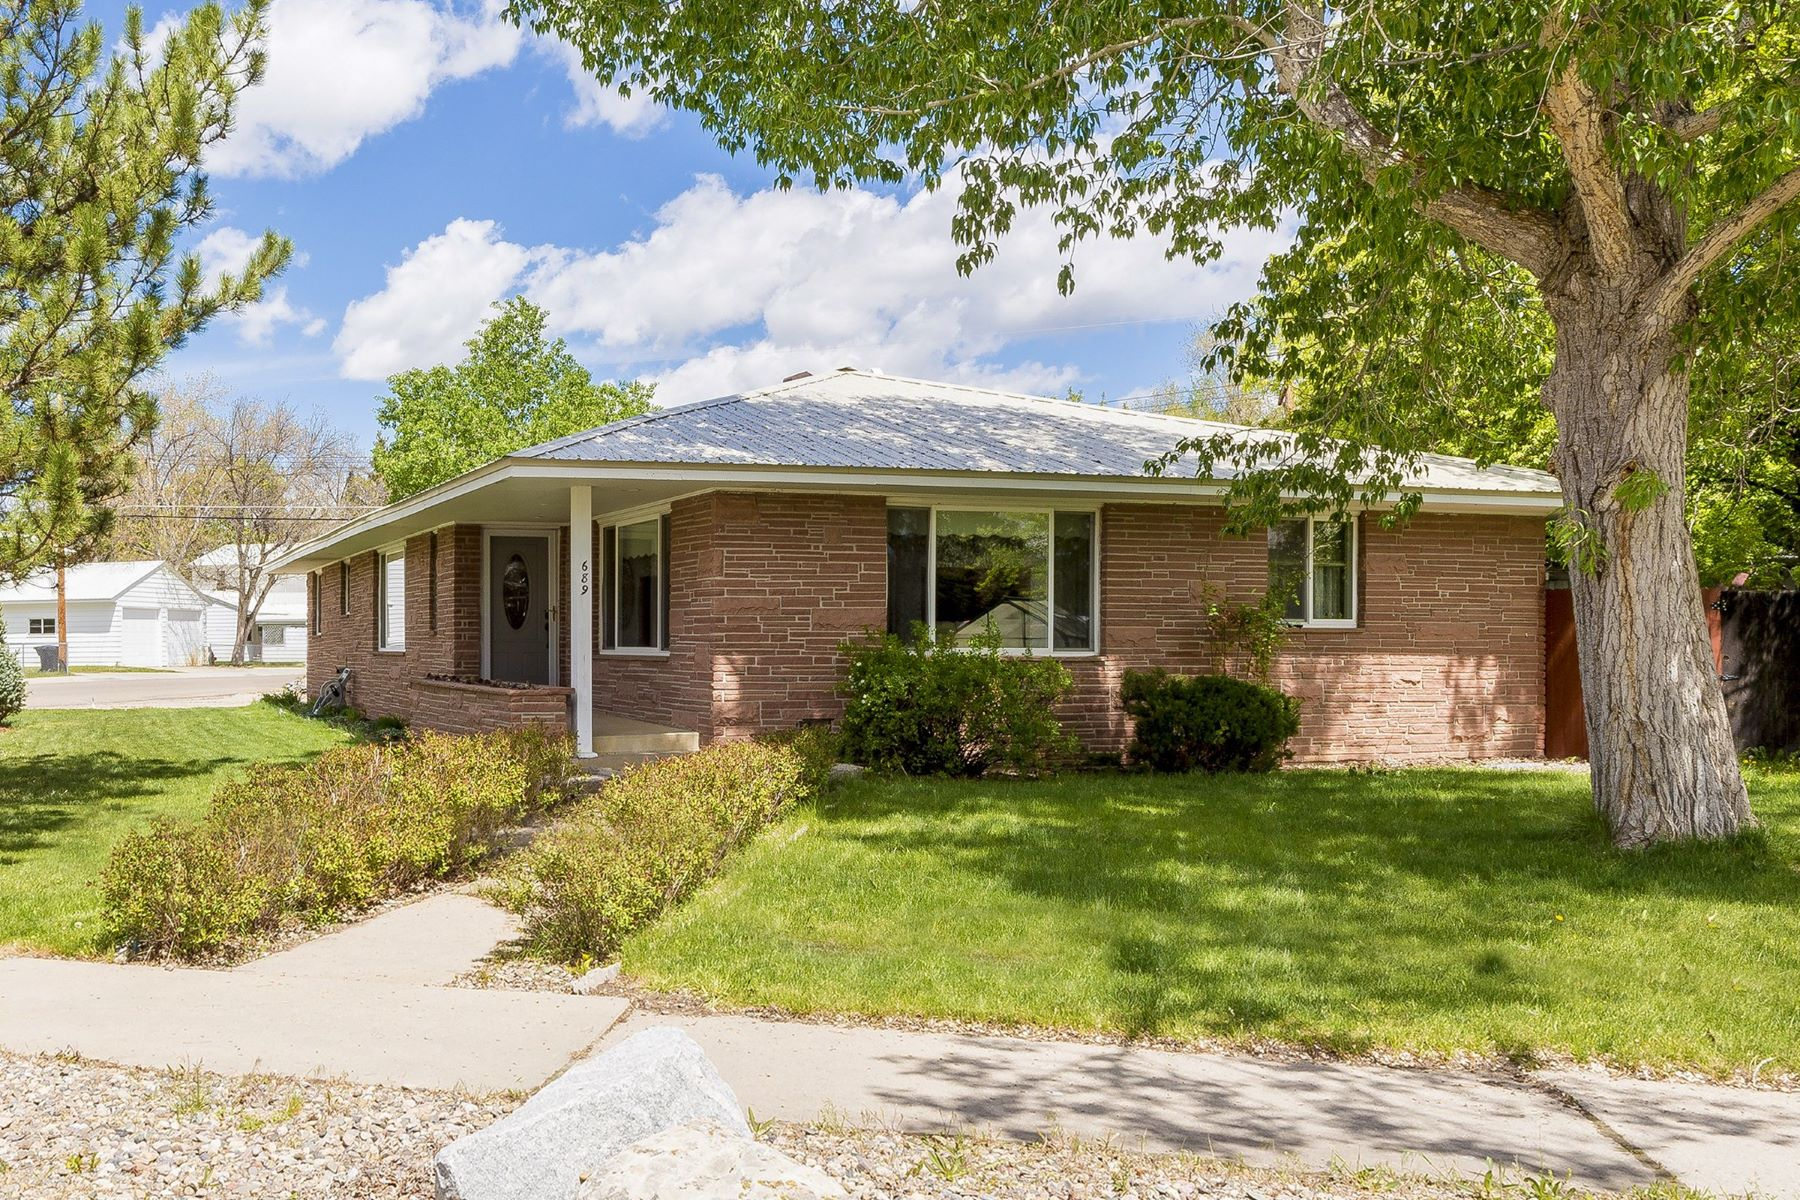 独户住宅 为 销售 在 Immaculate Classic Mid-Century Ranch Home 689 Pershing St. 克雷格, 科罗拉多州 81625 美国